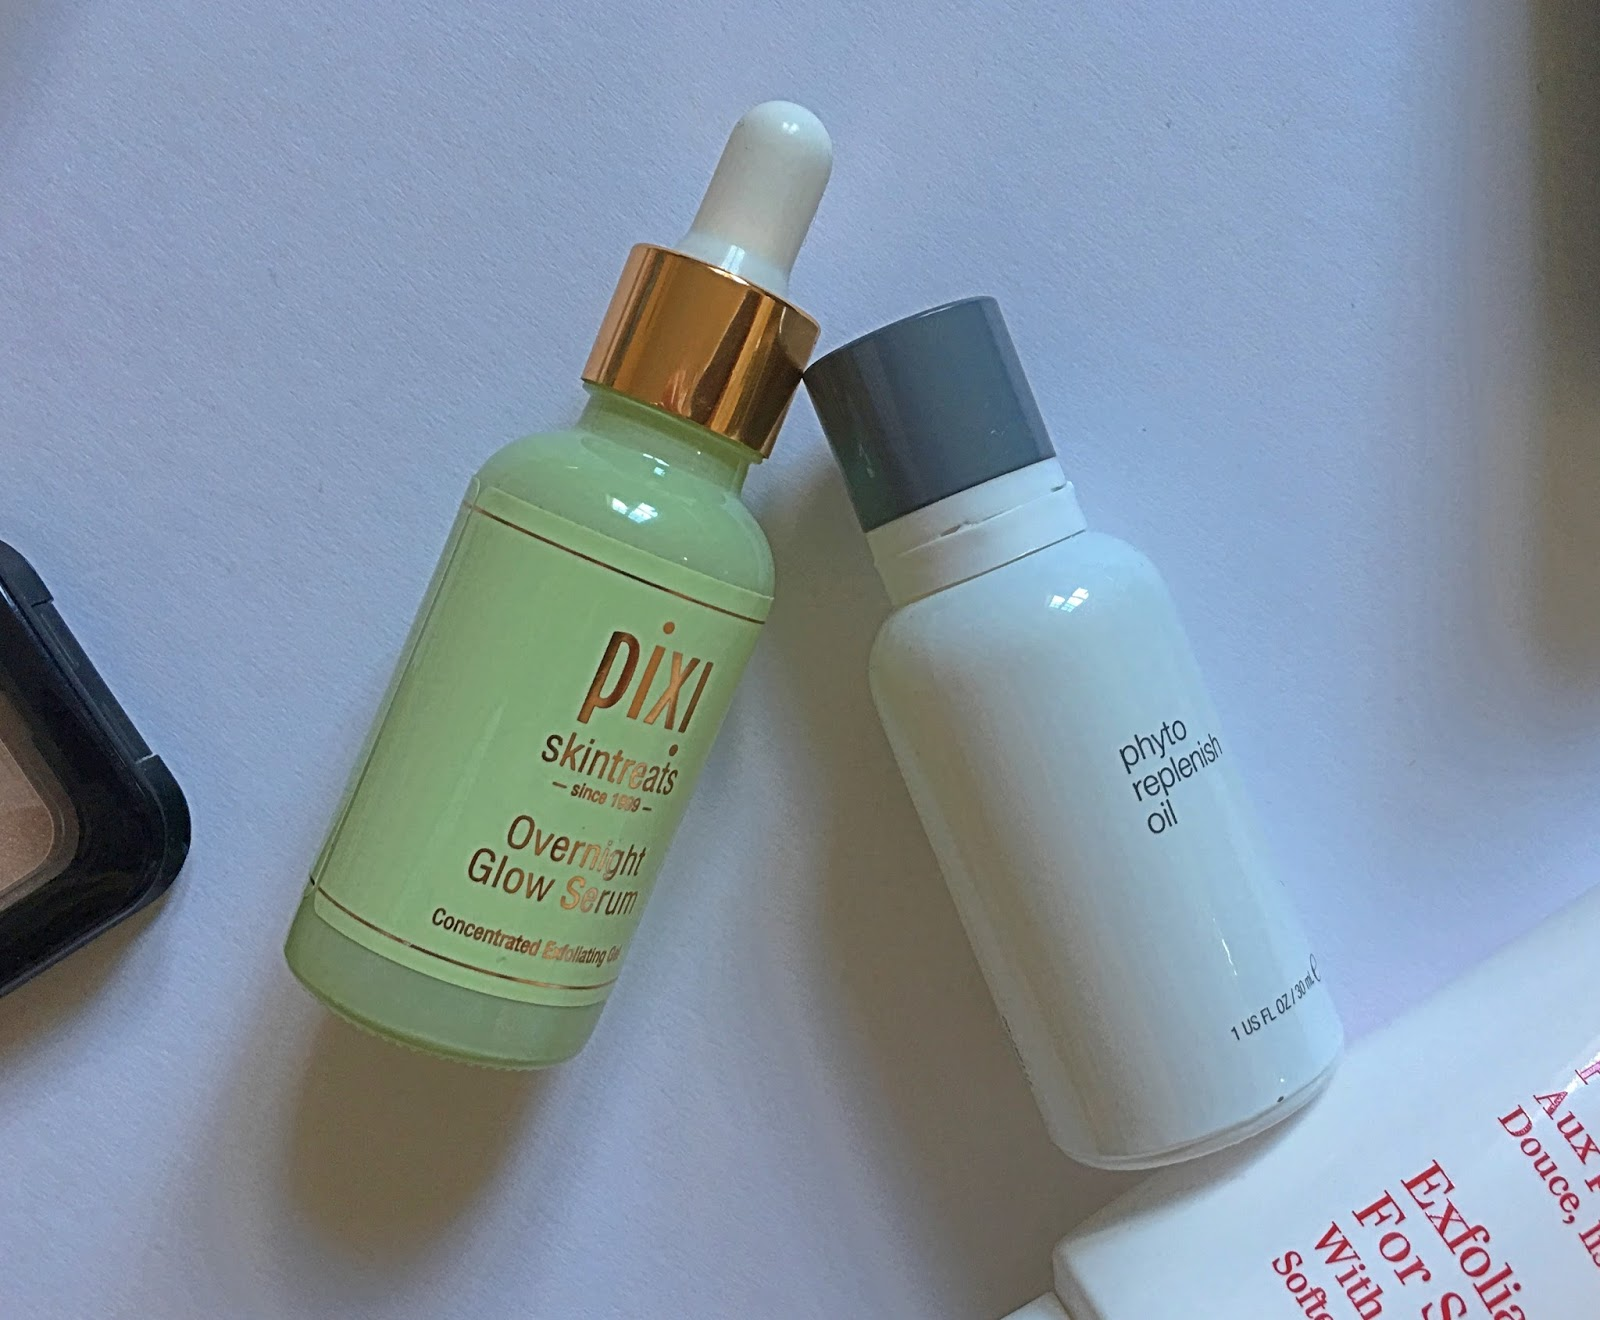 Pixi Overnight Glow Serum + Dermalogica Phyto Replenish Oil - Aspiring Londoner